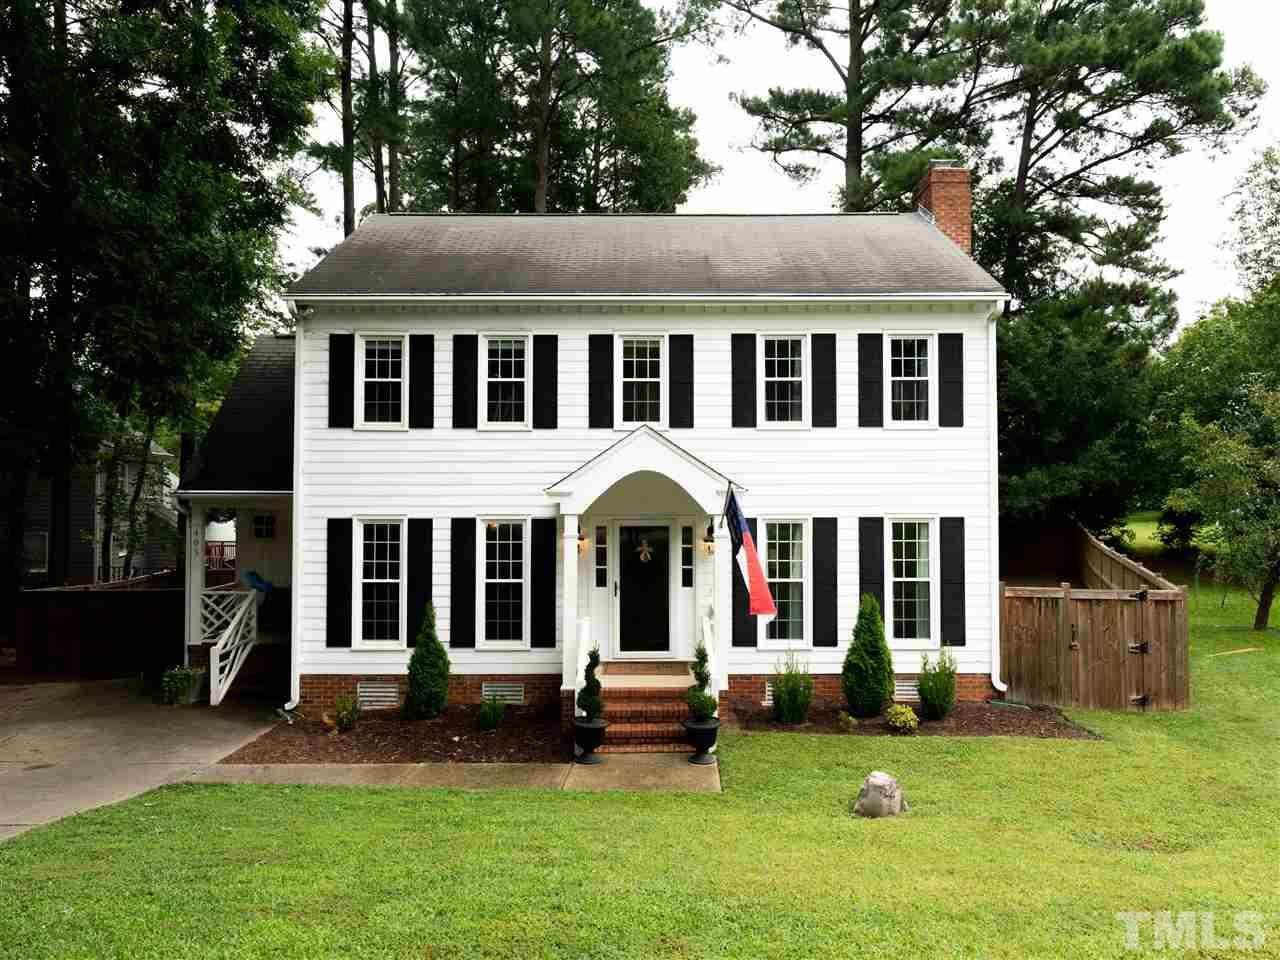 405 Robb Court, Raleigh, NC 27615 - MLS#: 2342826